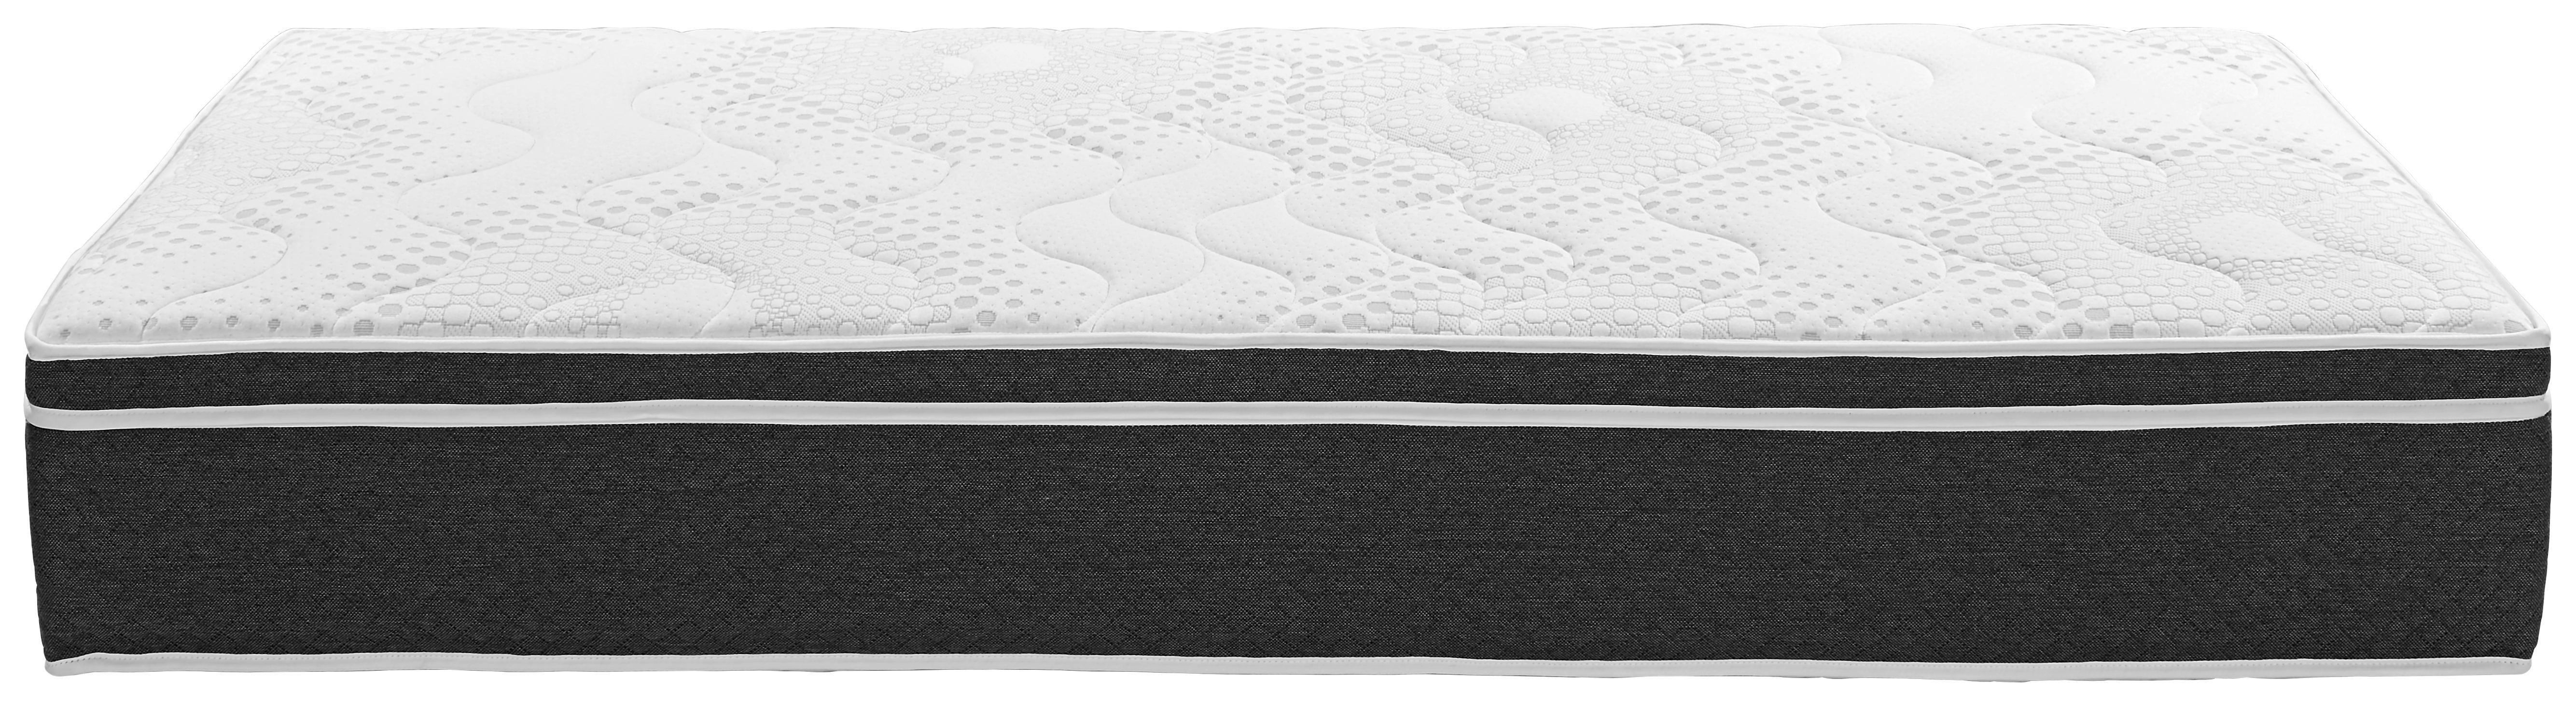 Boxspring Matrac Harmony Top H2 - fehér, textil (90/200cm)